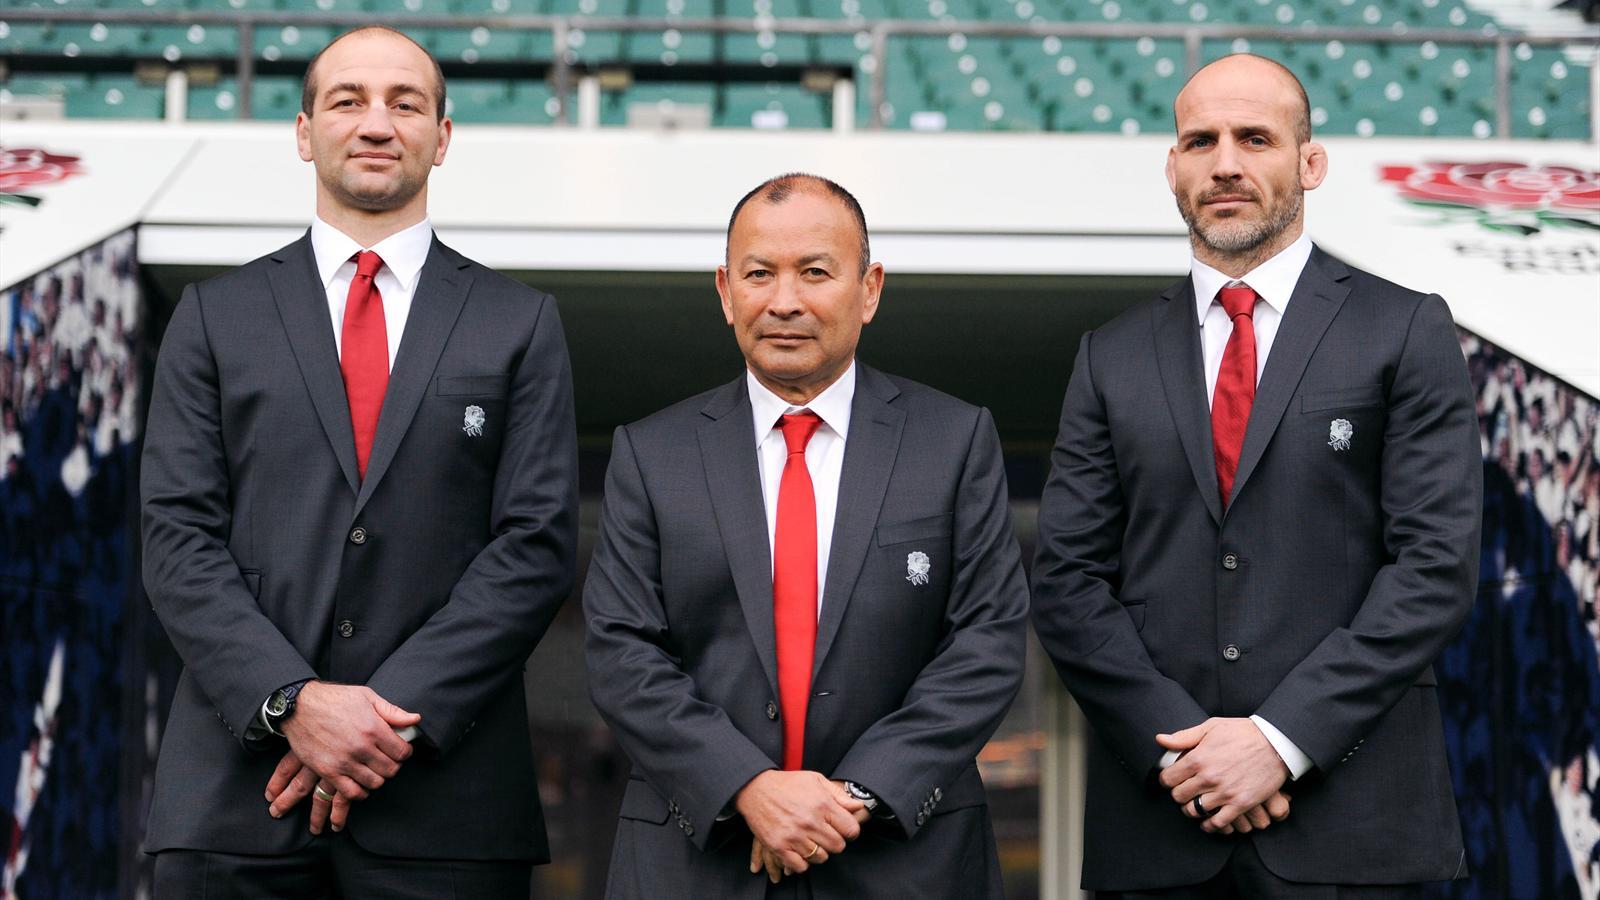 Le nouveau staff de l'Angleterre: Borthwick, Jones et Gustard